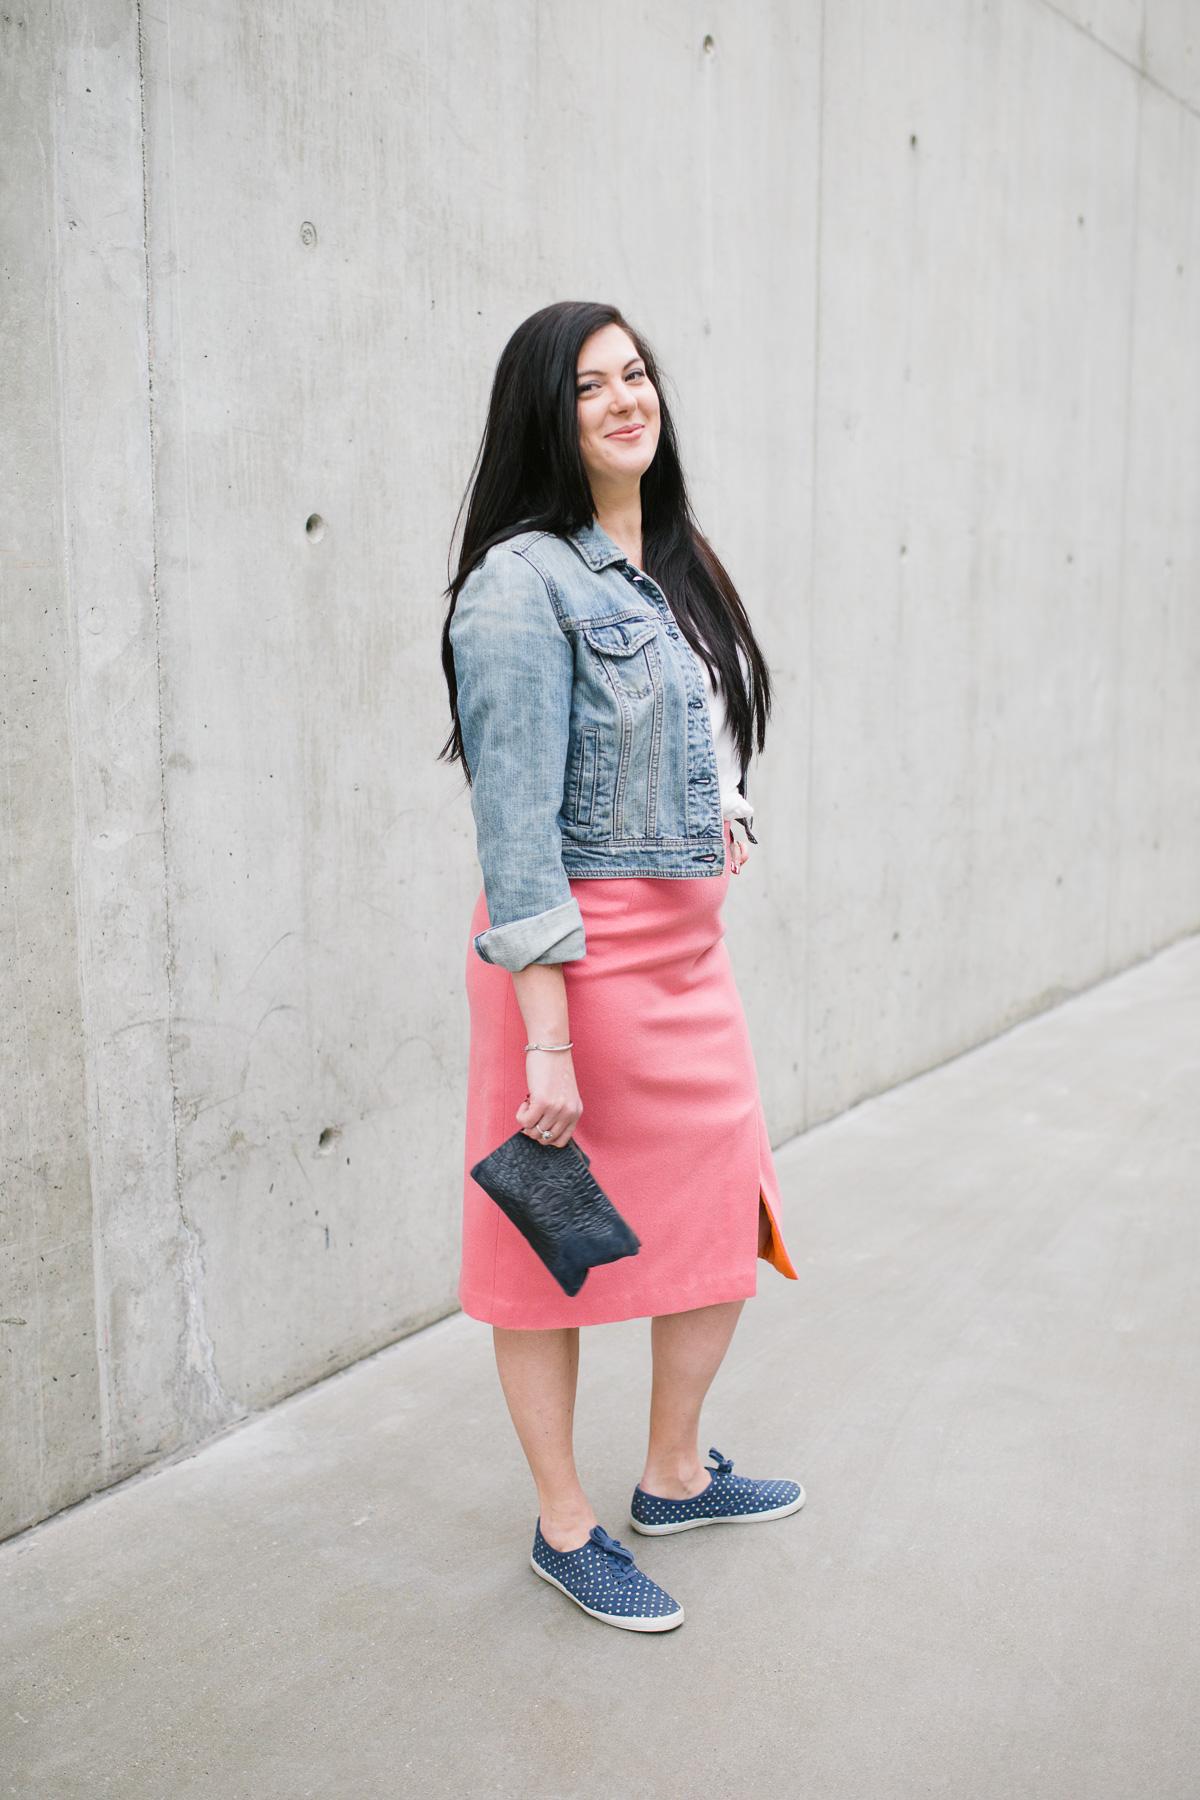 AN_PnP_Fashion-PinkskirtCasual001.jpg